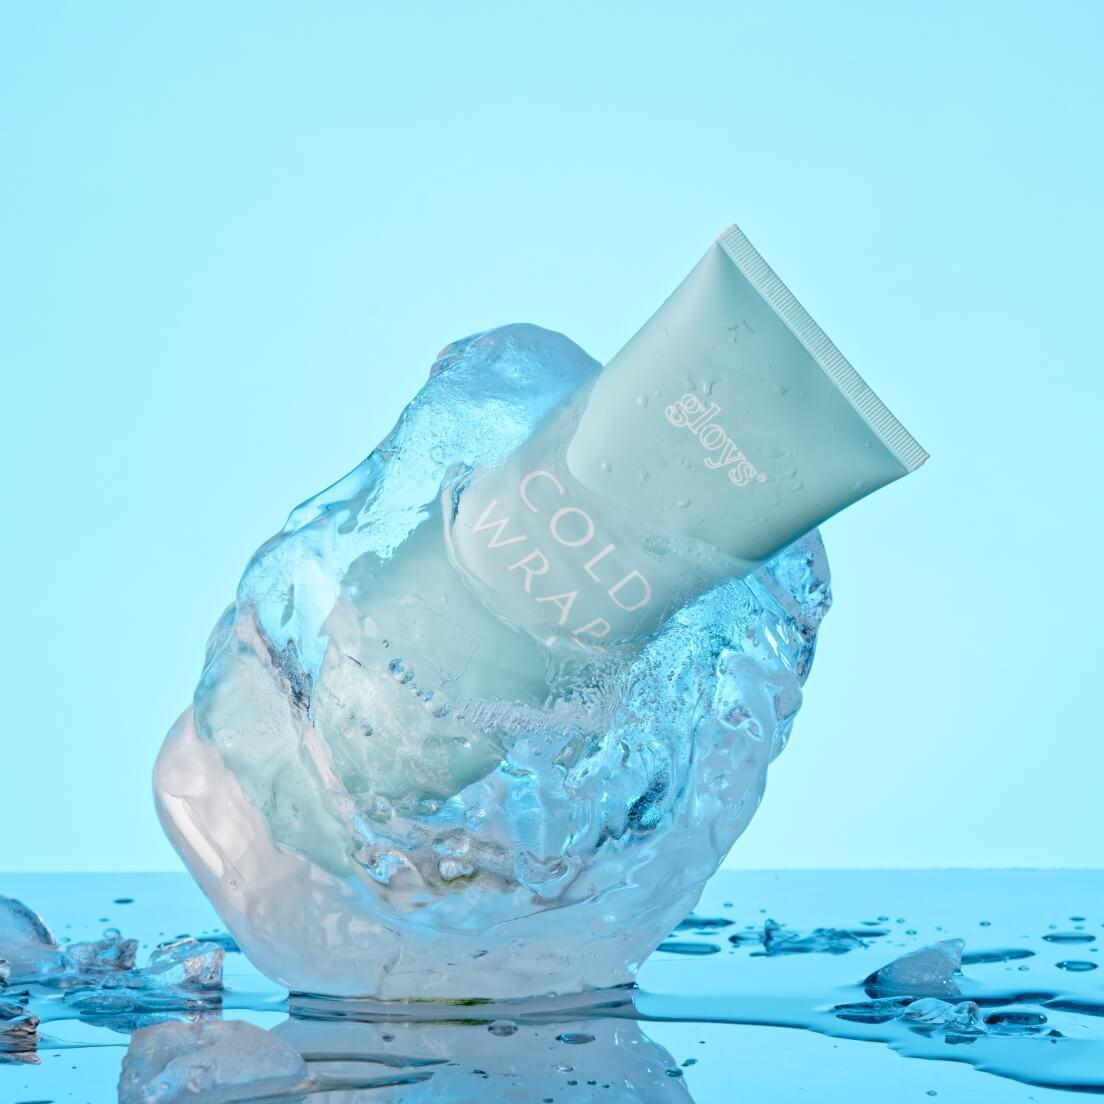 Gloys Cold Wrap крем-маска для холодного антицеллюлитного обертывания 250мл